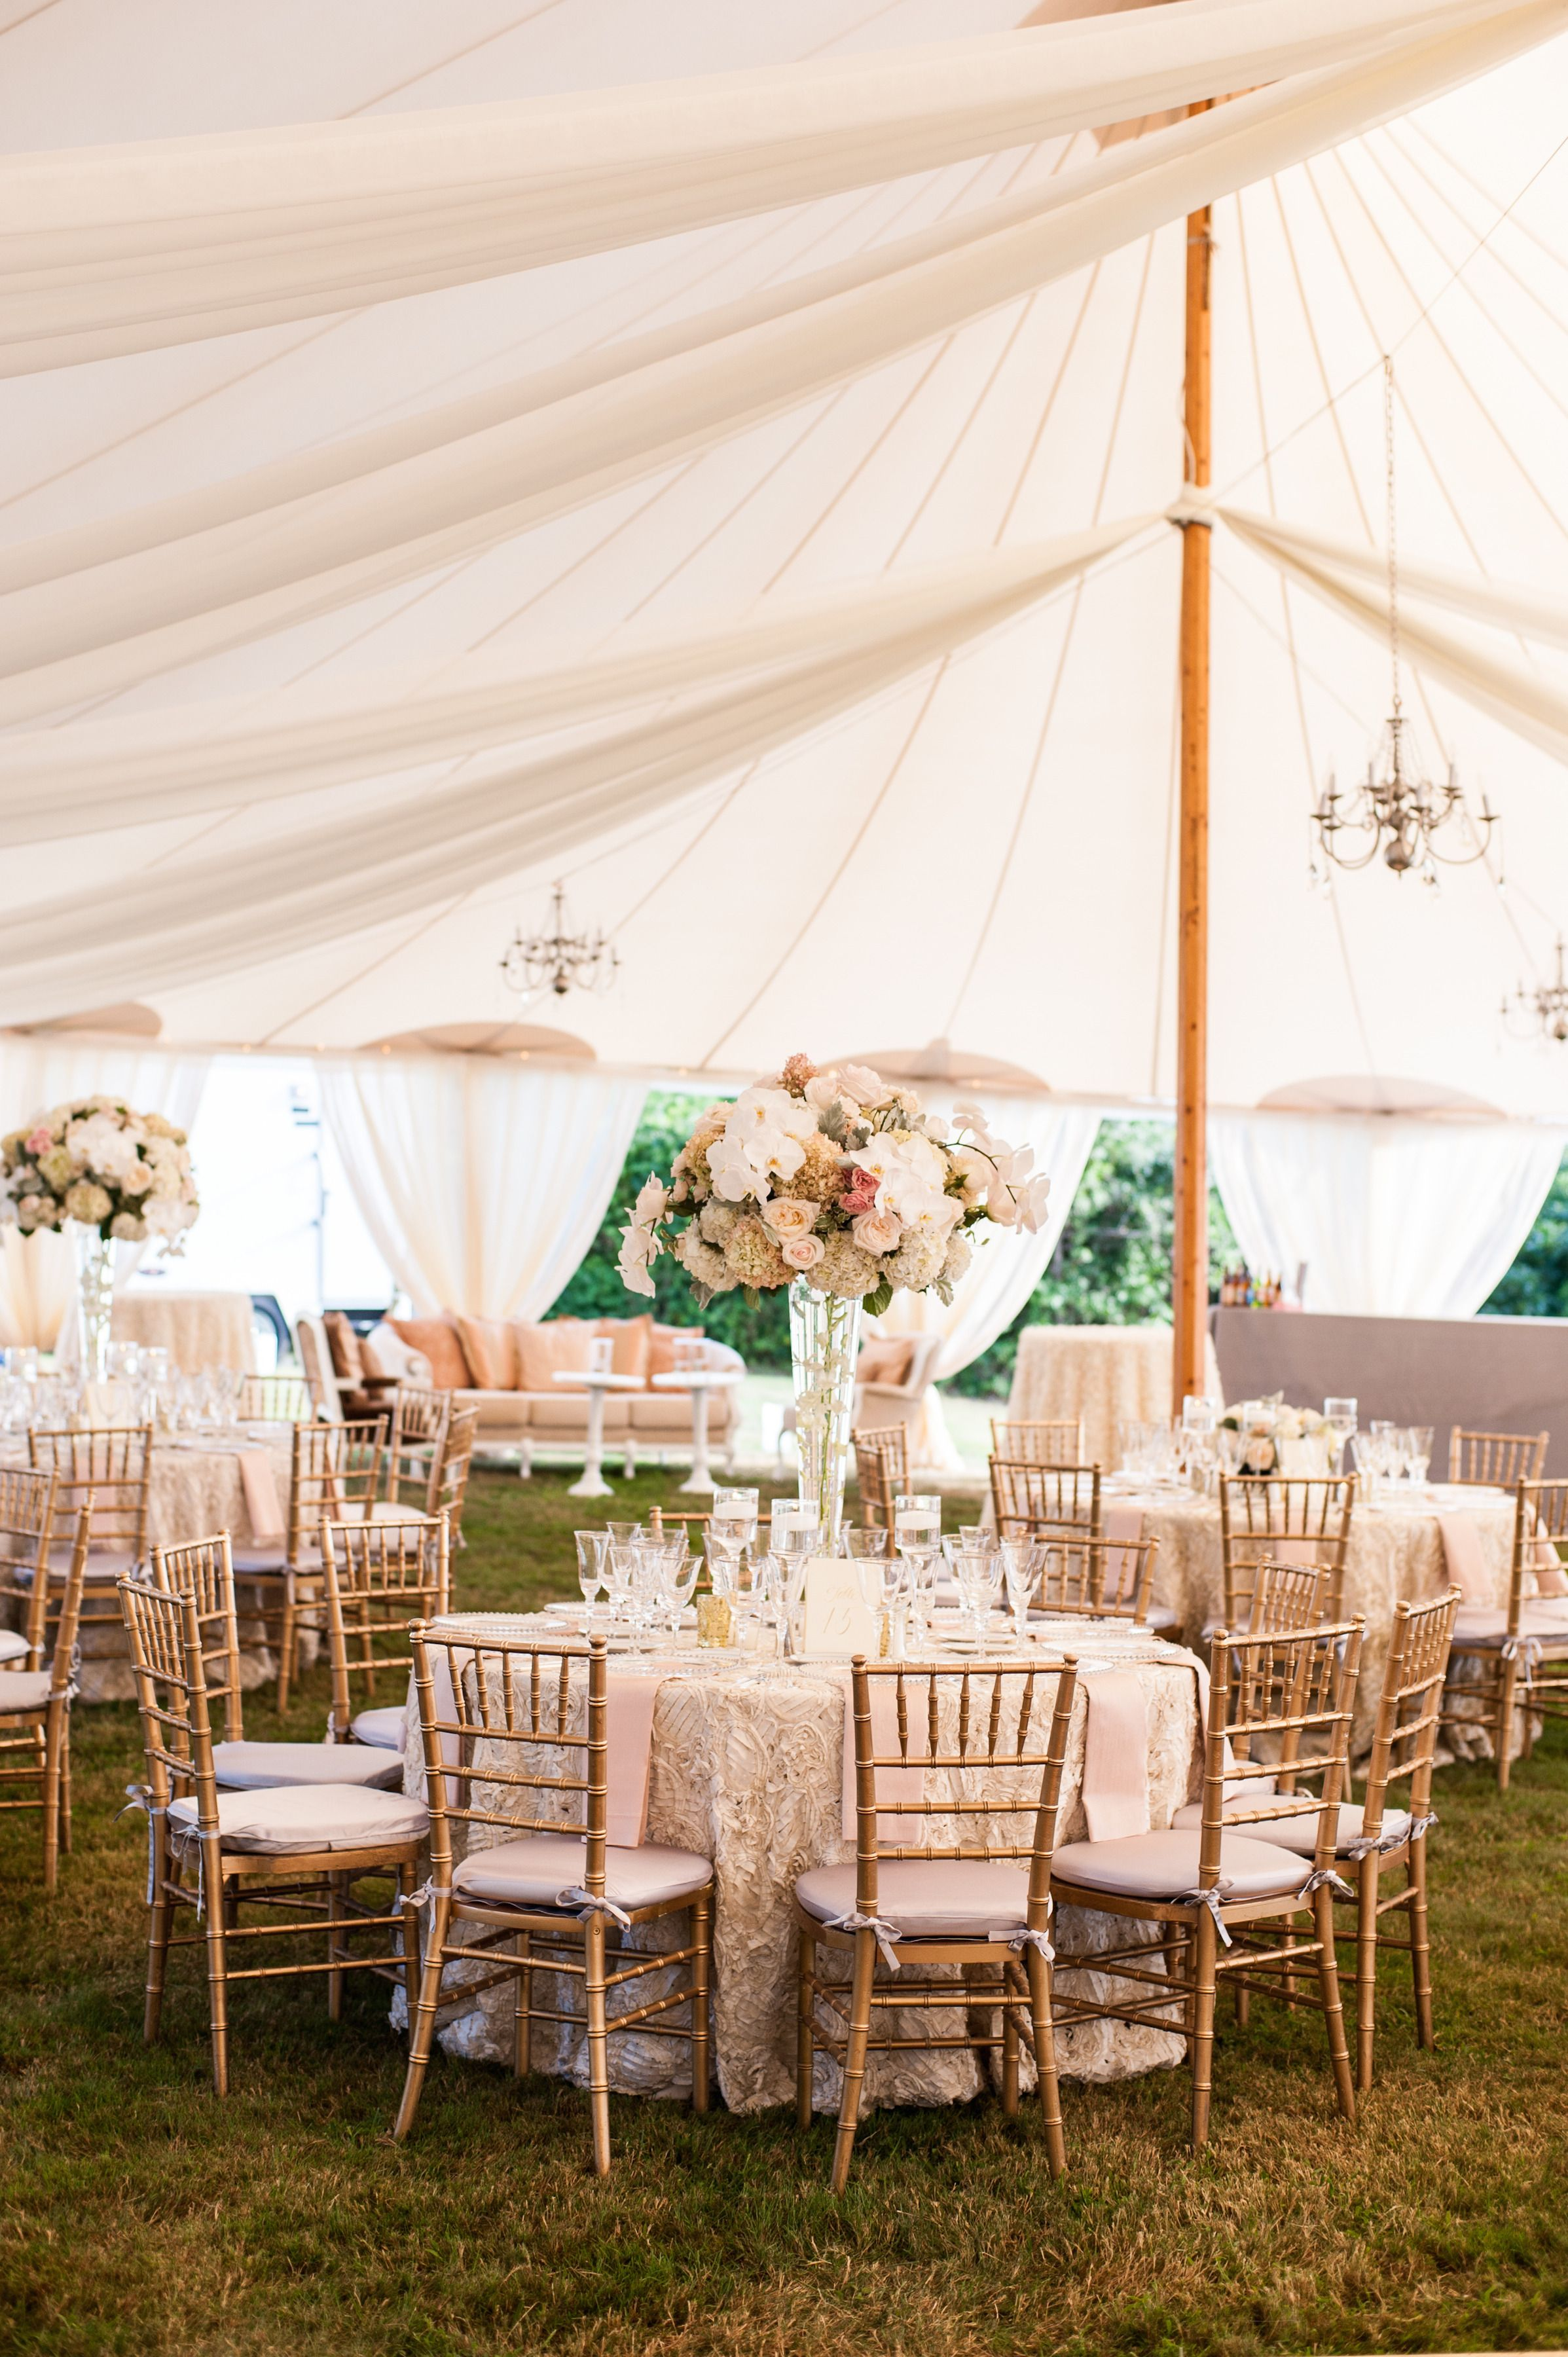 Sperry Tents Tent wedding, Wedding reception decorations